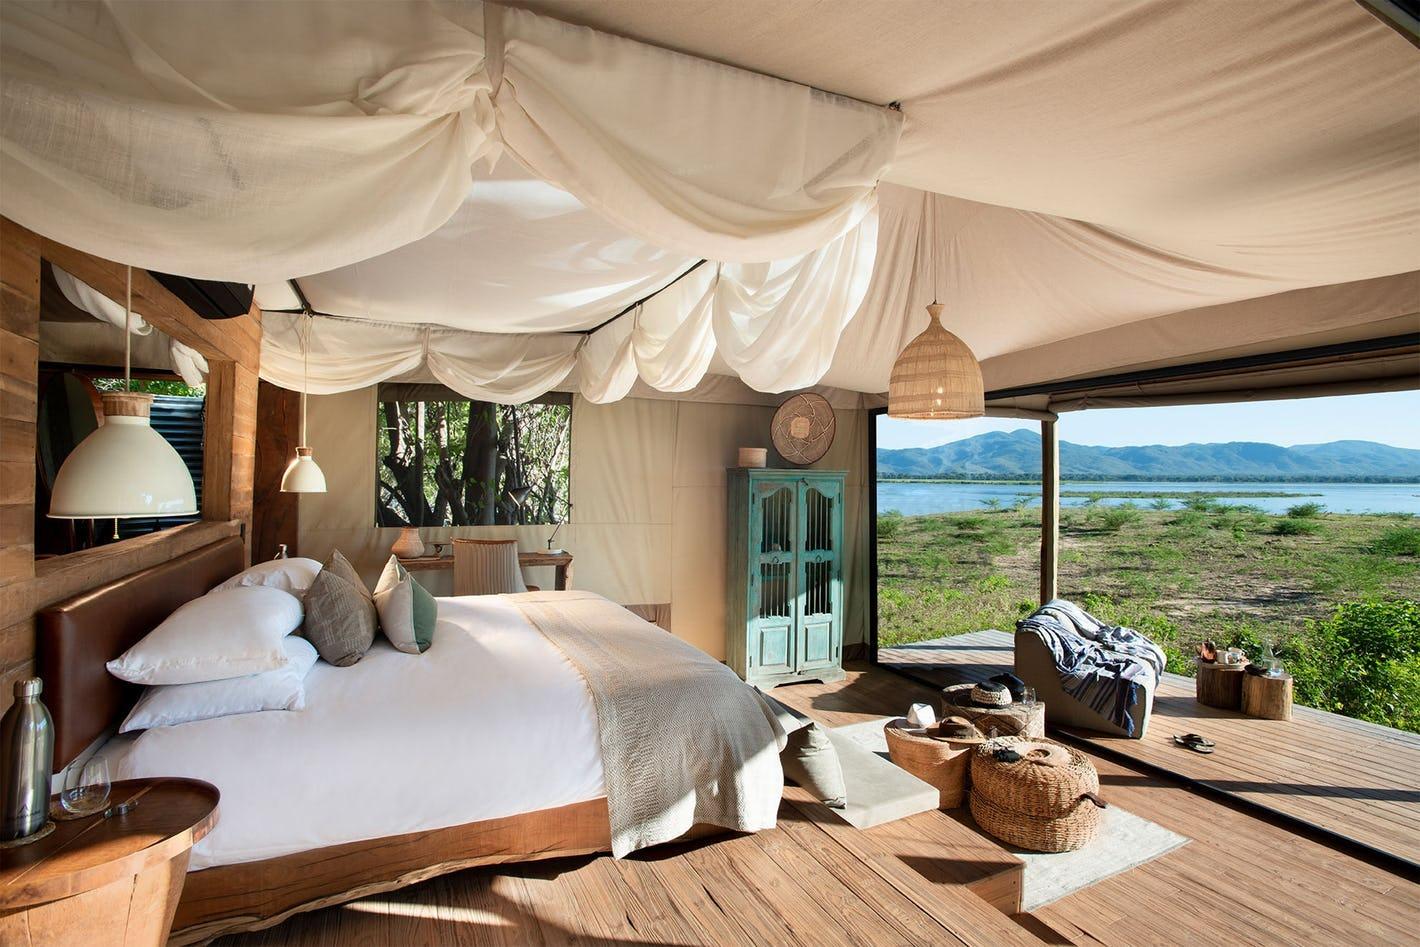 How to plan an affordable Zimbabwe safari